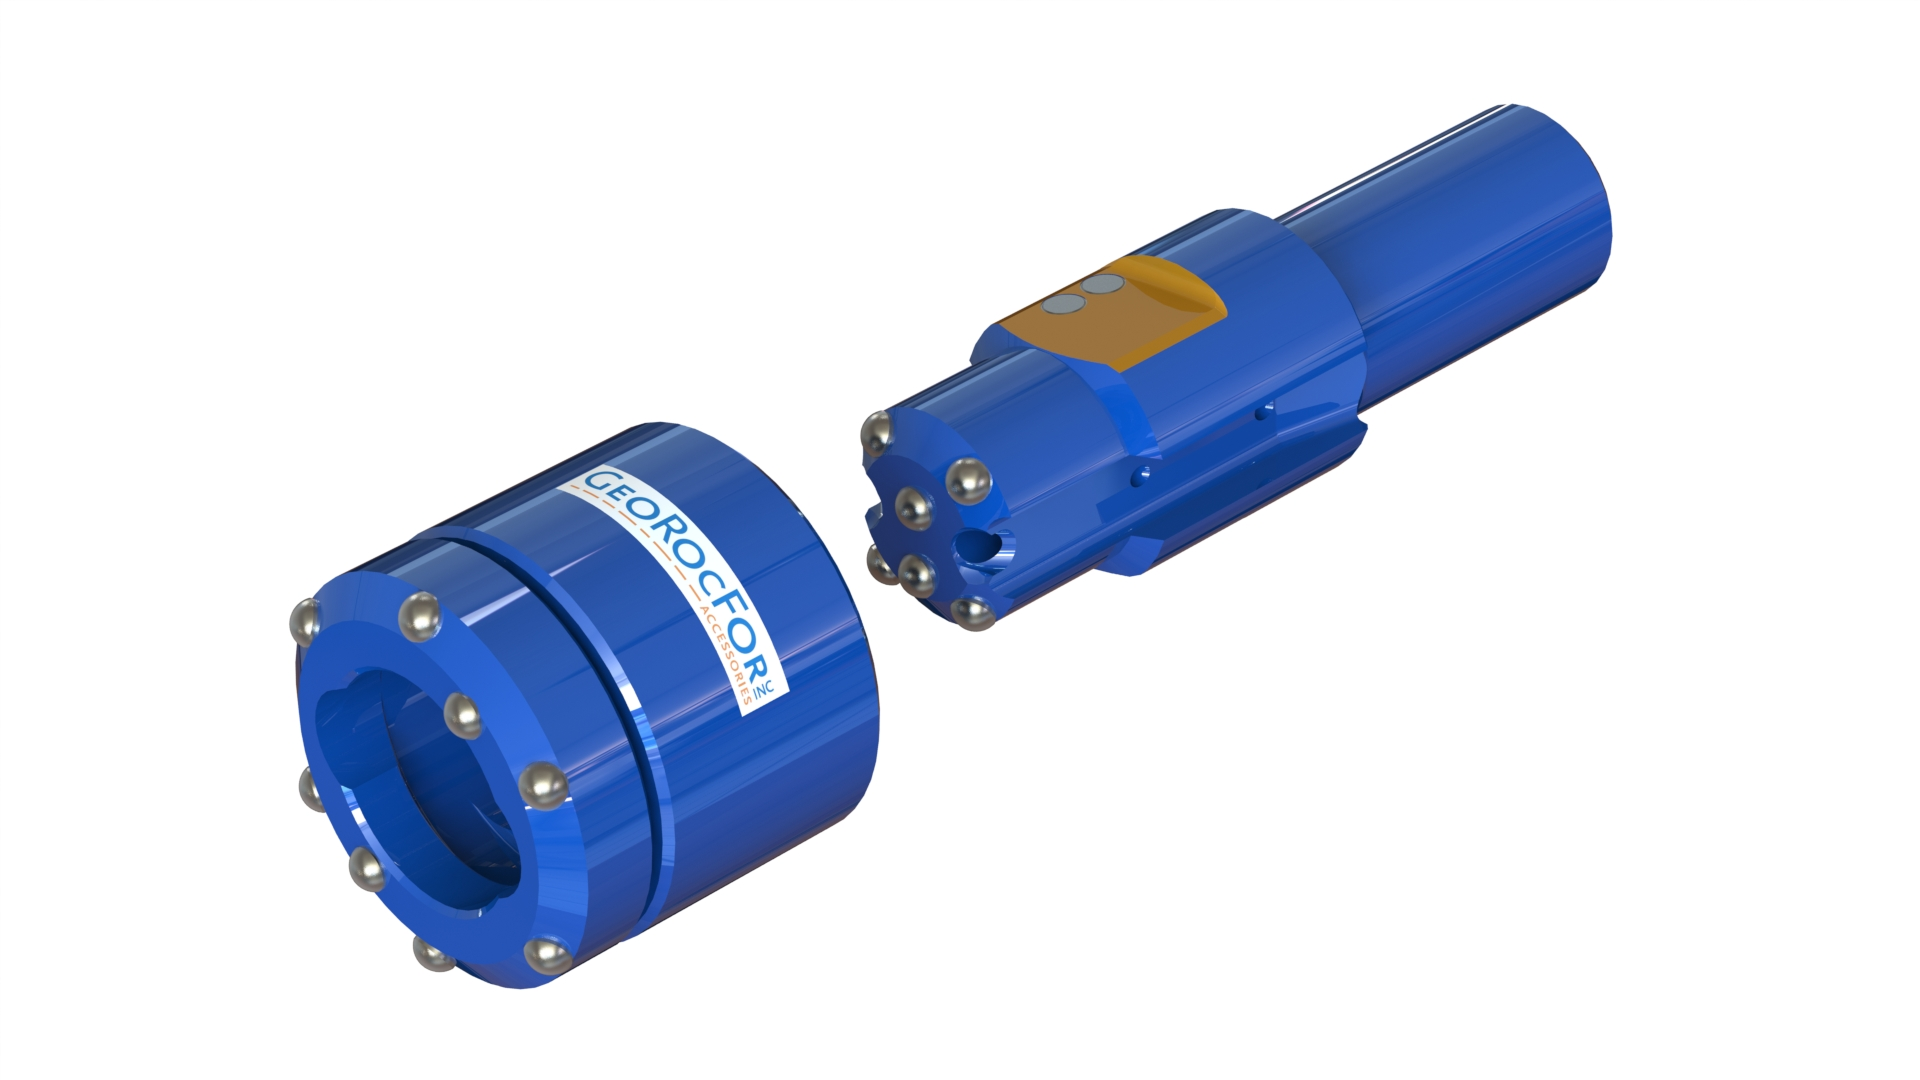 Xs FP 3,000″ / 76.2mm